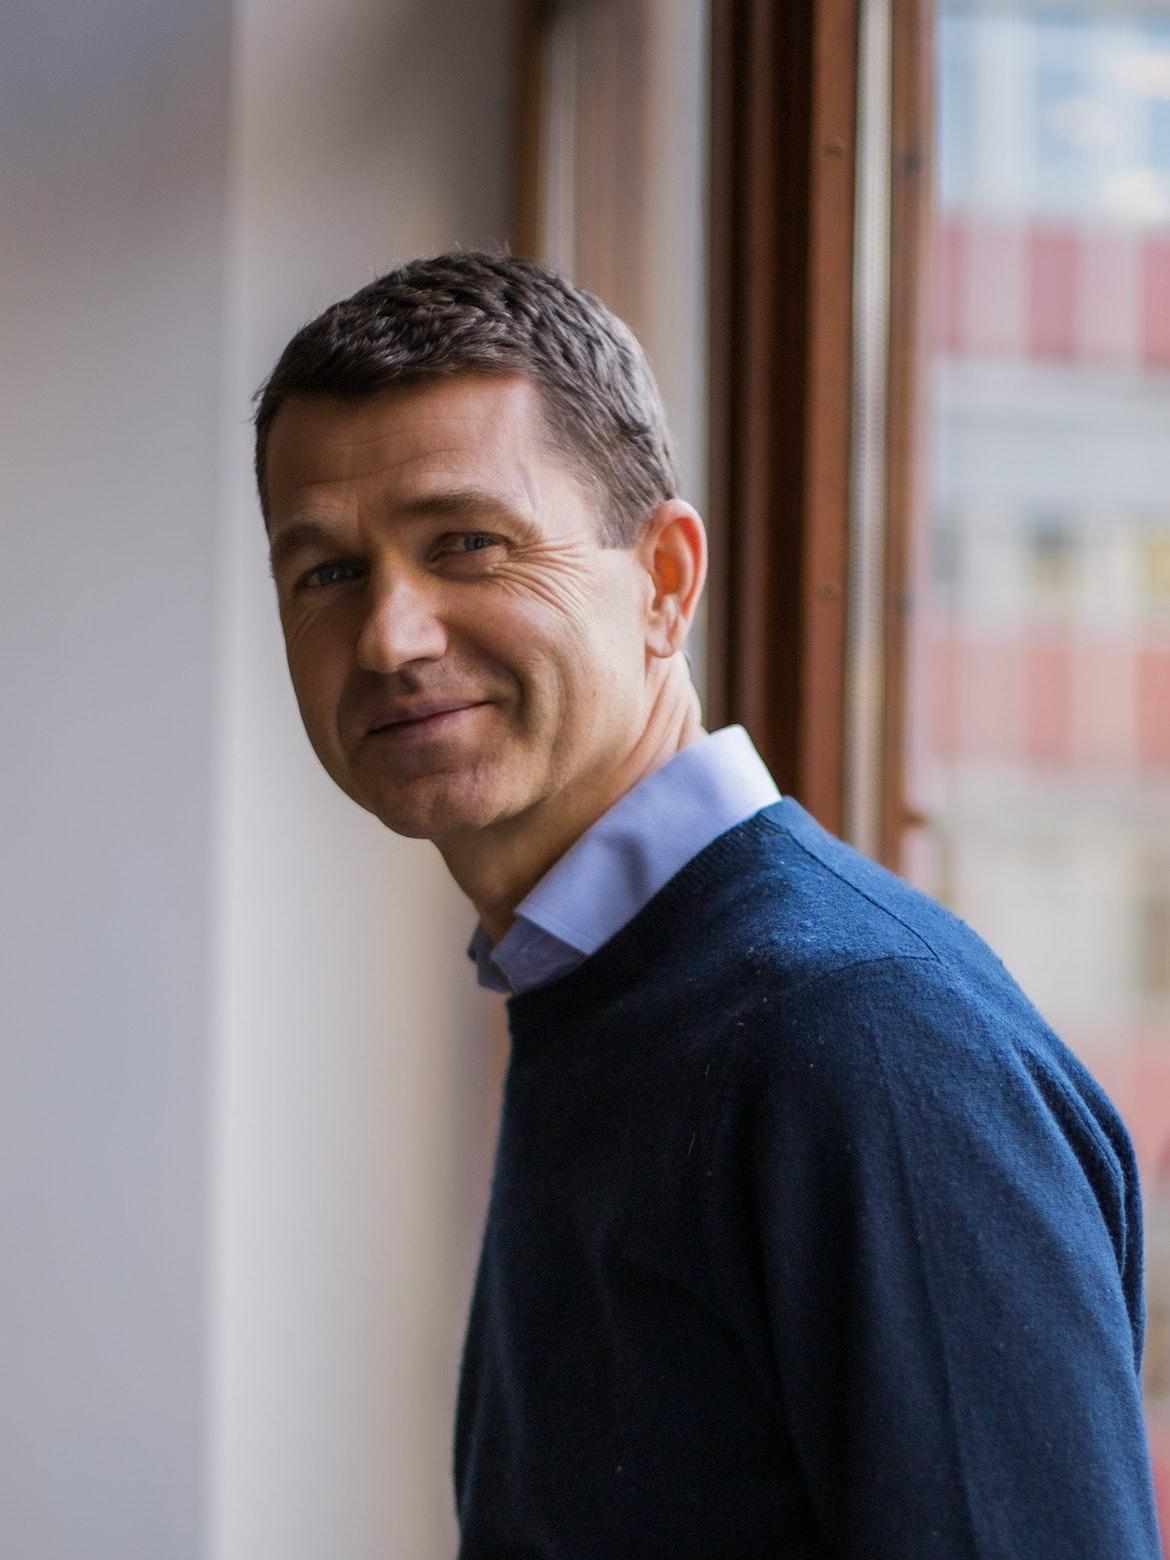 Andreas Poulsson 1 1